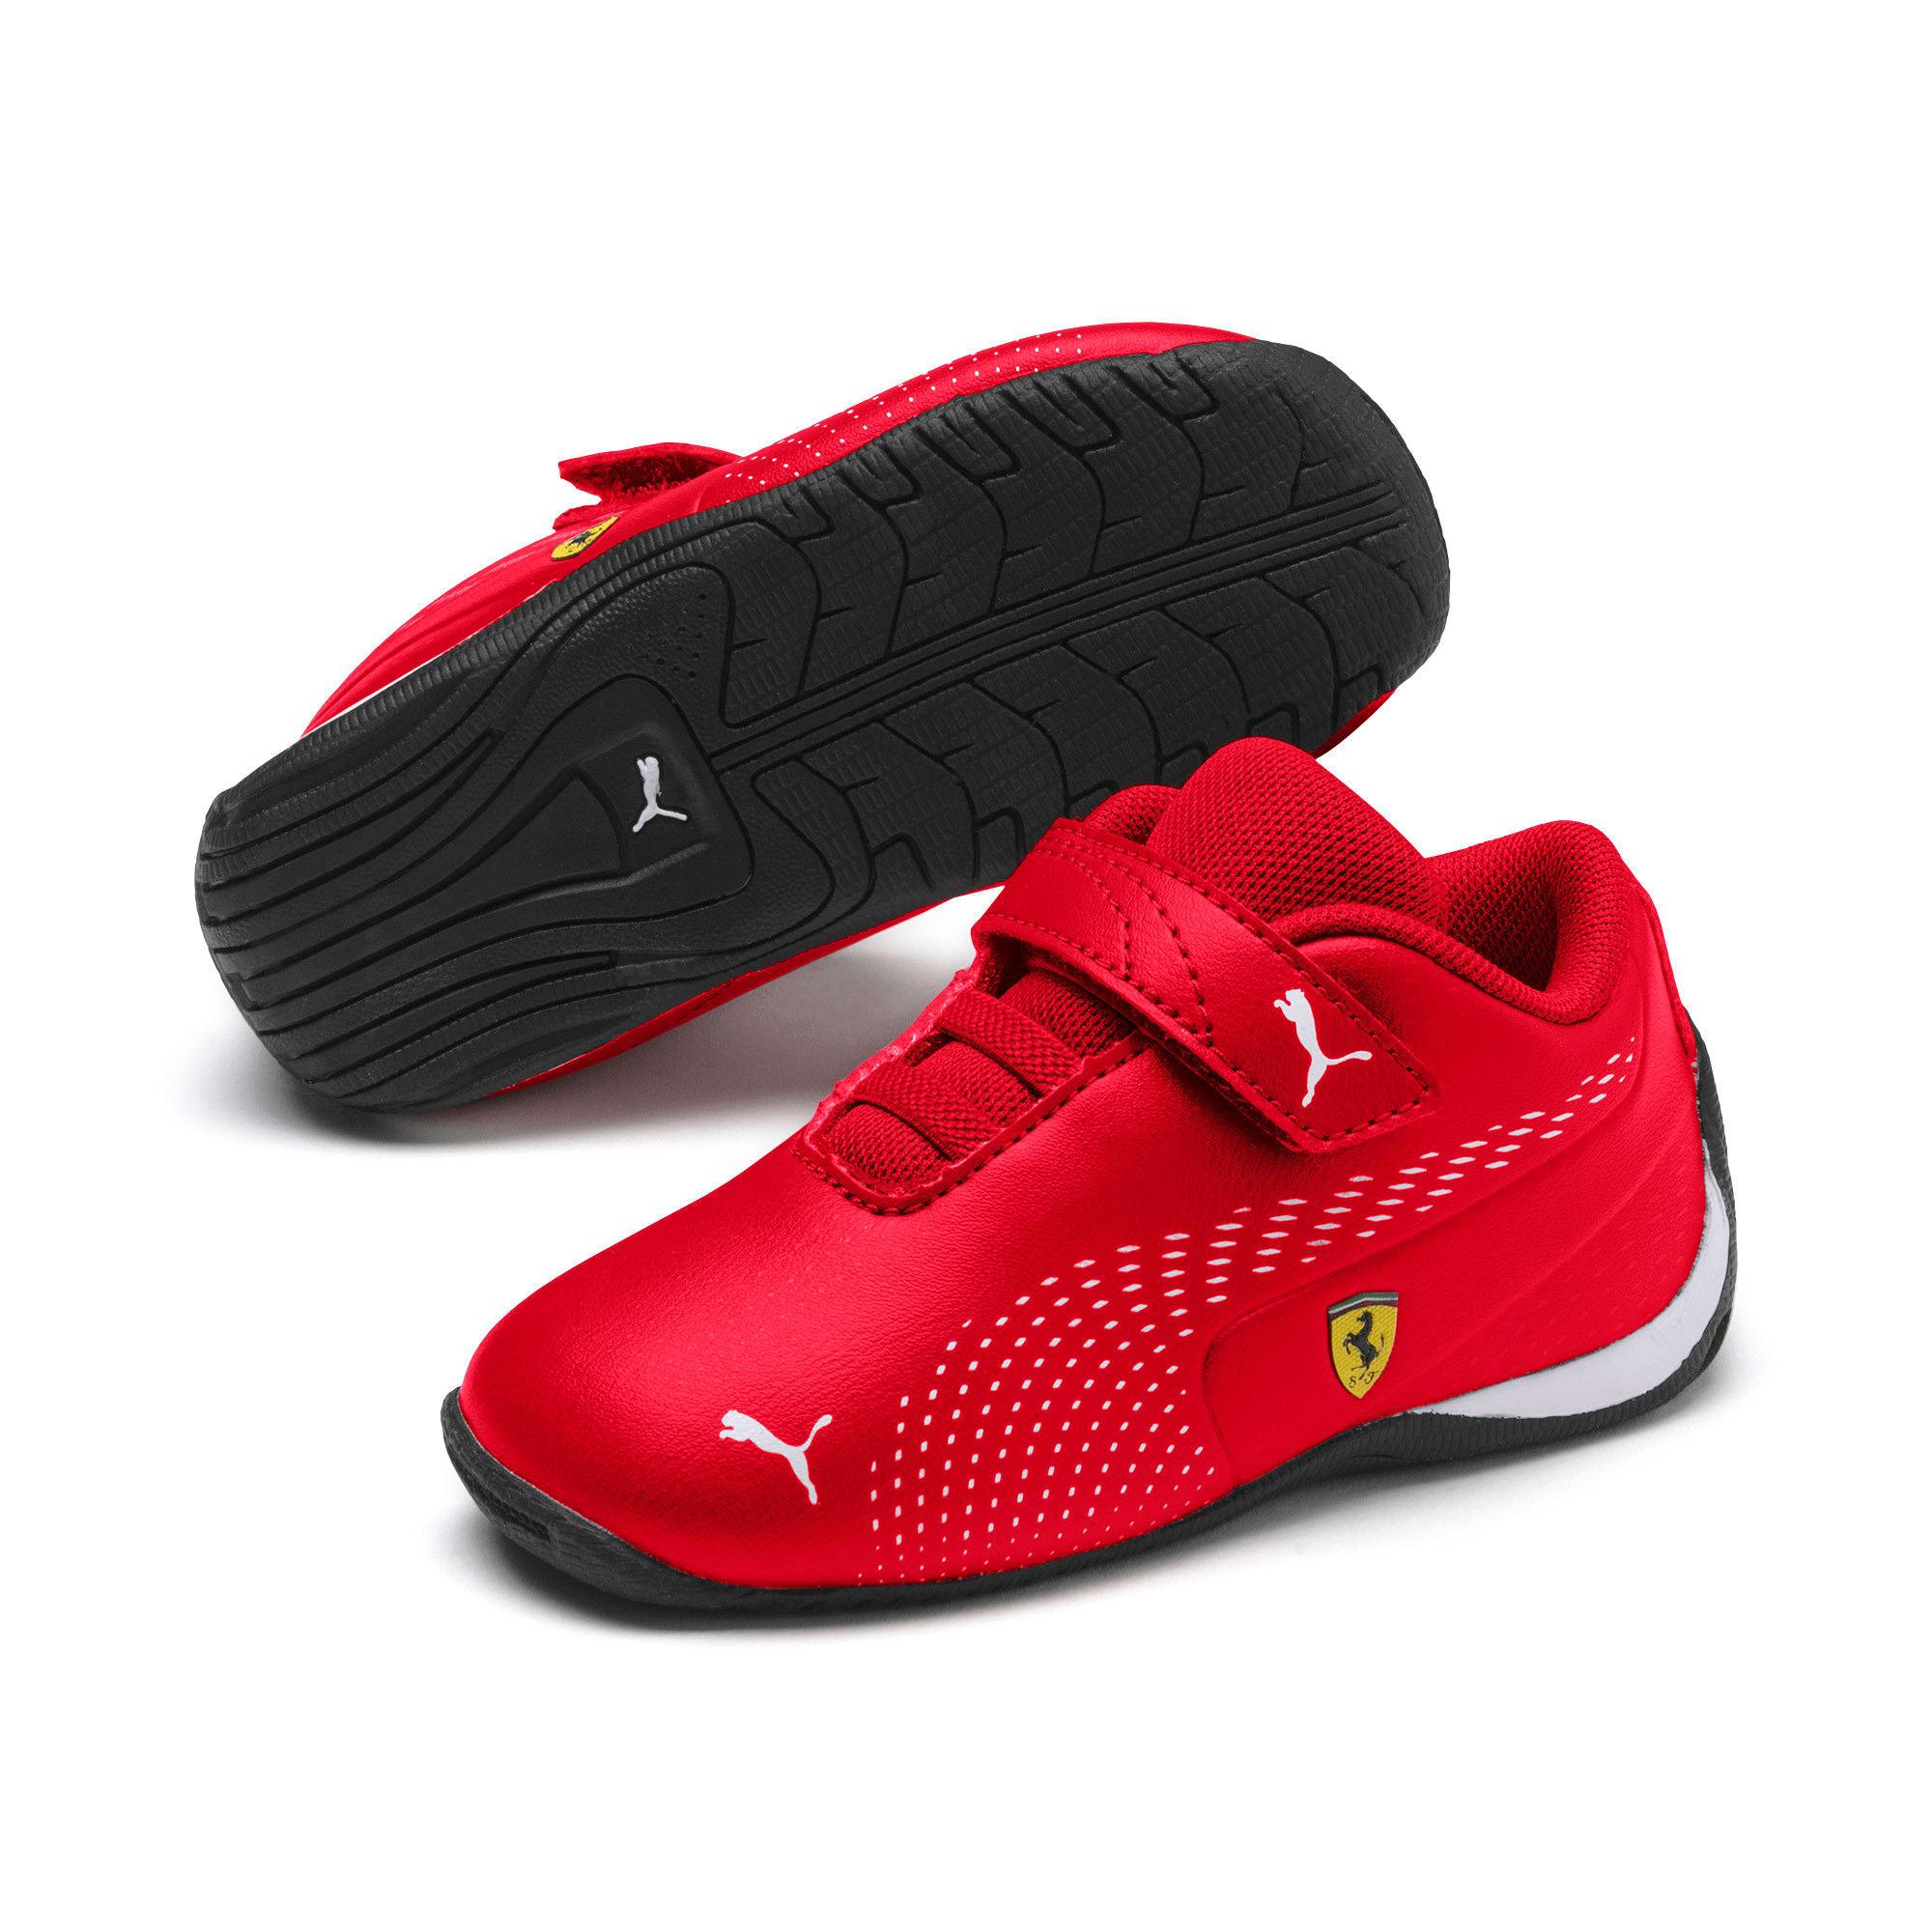 Thumbnail 2 of Scuderia Ferrari Drift Cat 5 Ultra II Toddler Shoes, Rosso Corsa-Puma White, medium